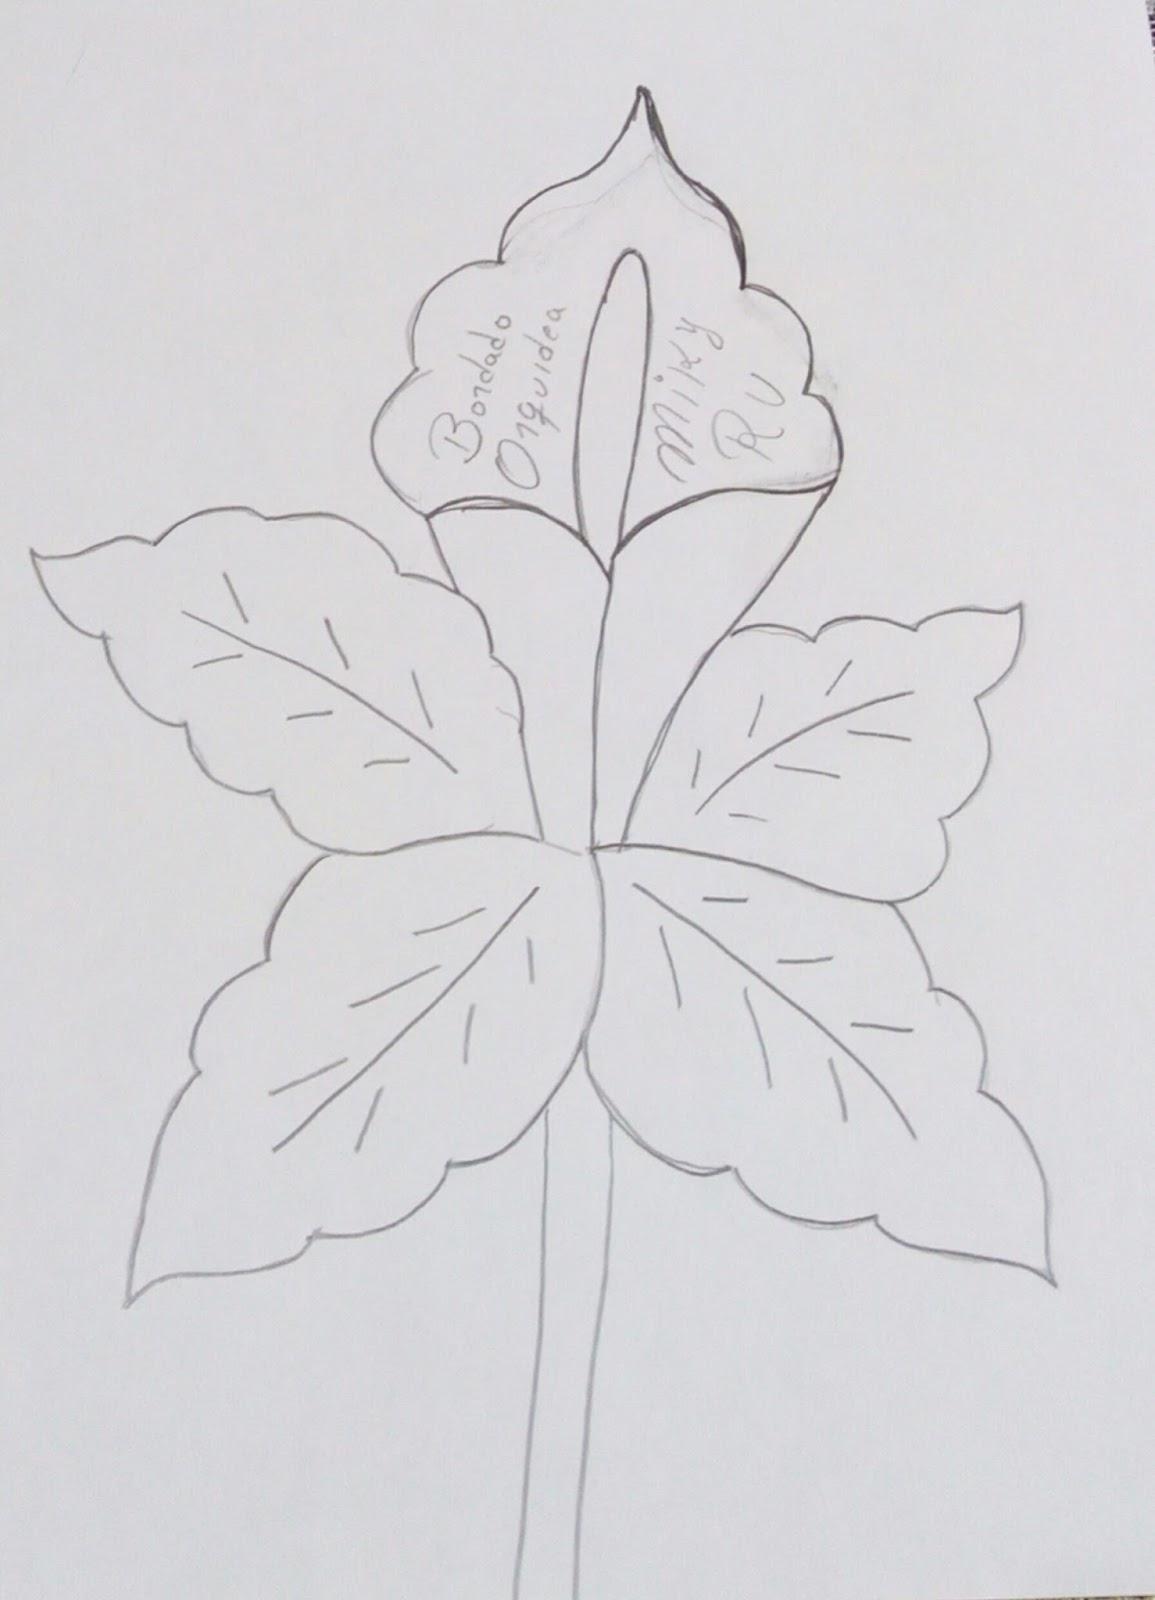 Orquideas Dibujo - Get Yasabe